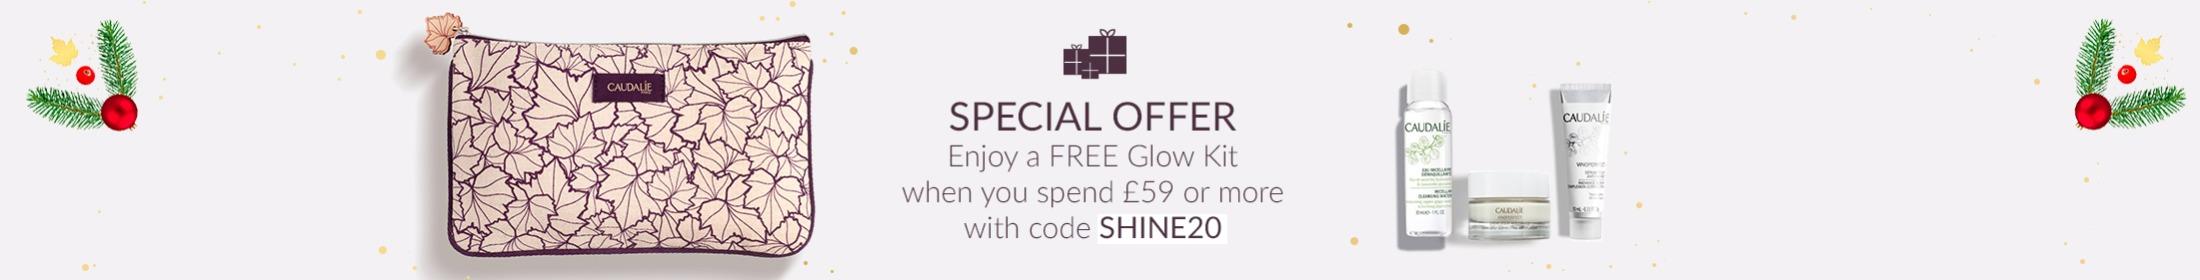 Your FREE Glow Kit